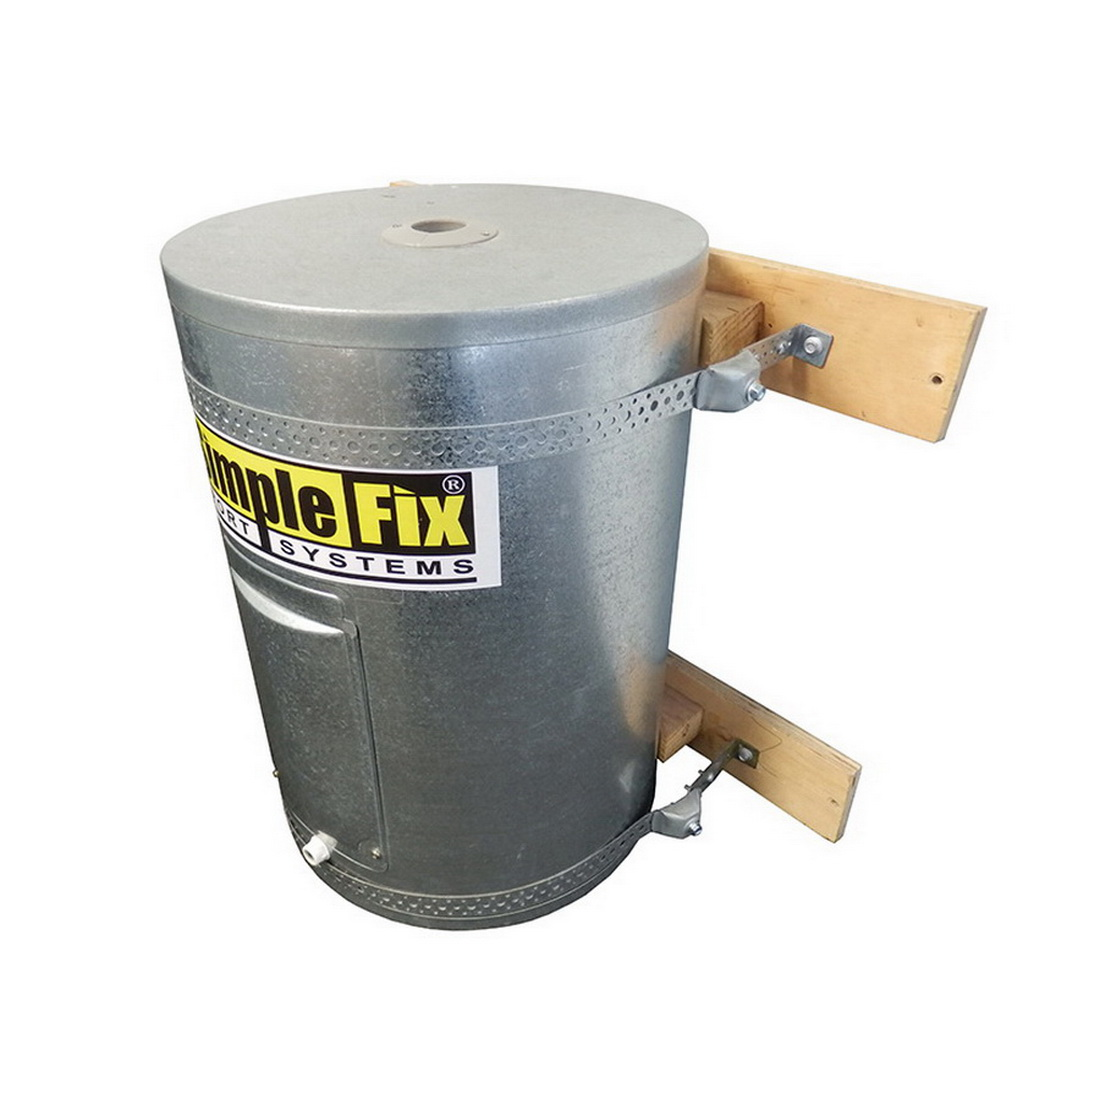 2 Strap Seismic Cylinder Restraint Kit